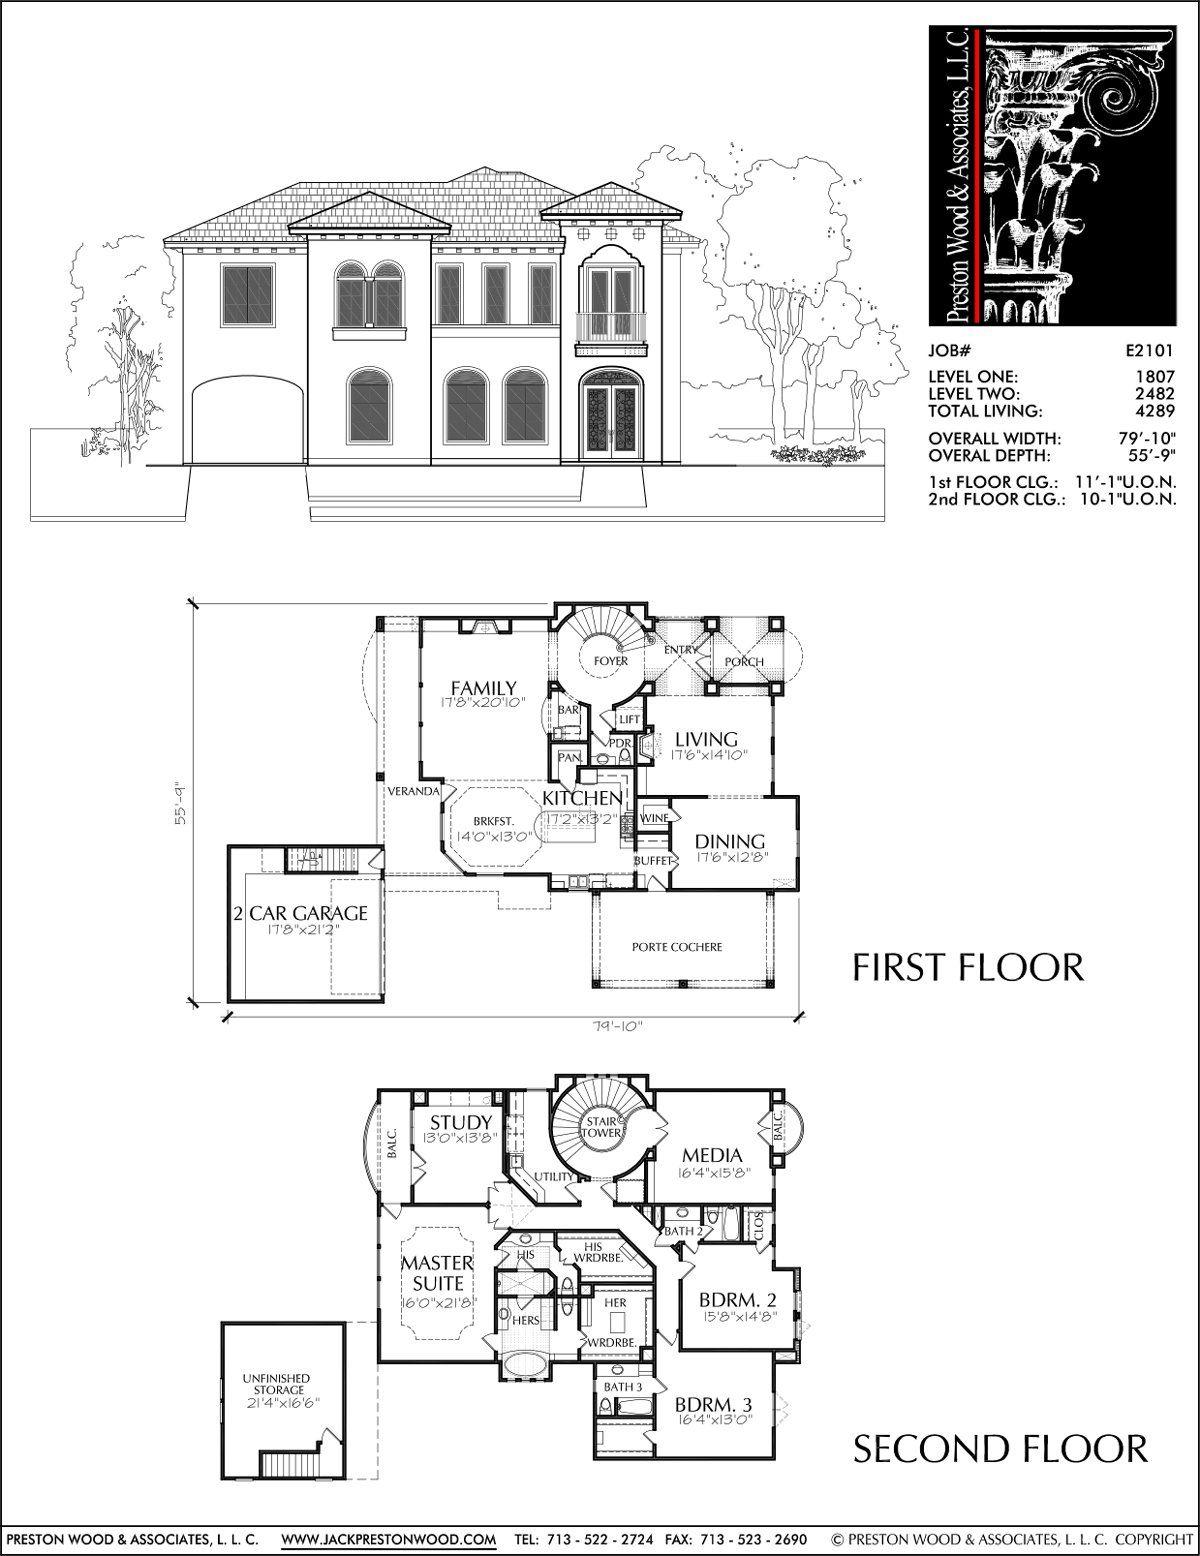 Best Two Story Housing, Custom 2 Story Home Blueprints